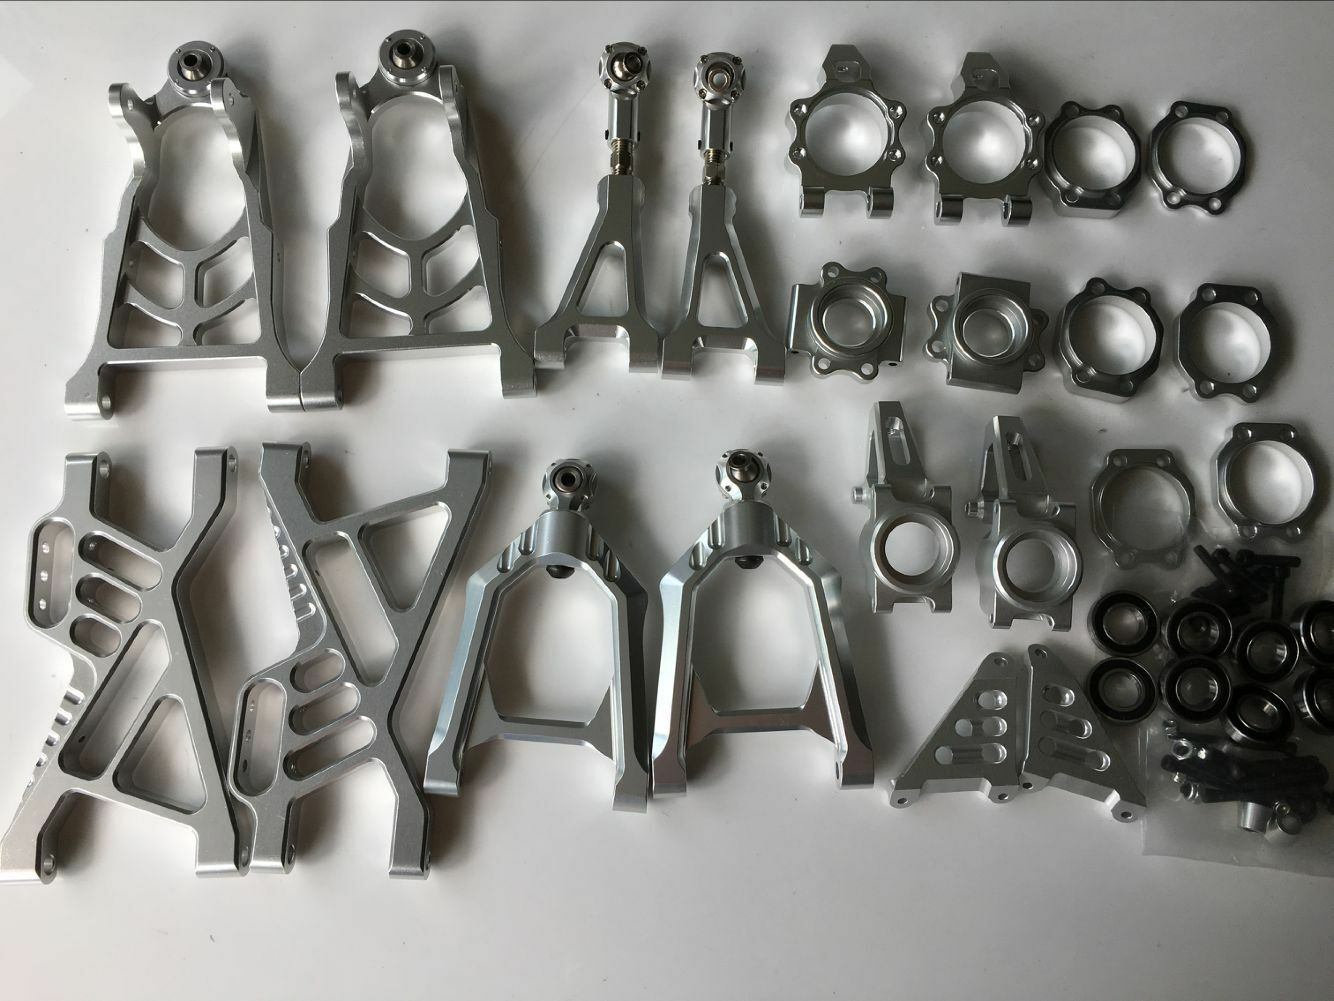 CNC tuttioy suspension arm rueda hub autorier  for 1 5 HPI baja 5b parts km rovan  acquista marca